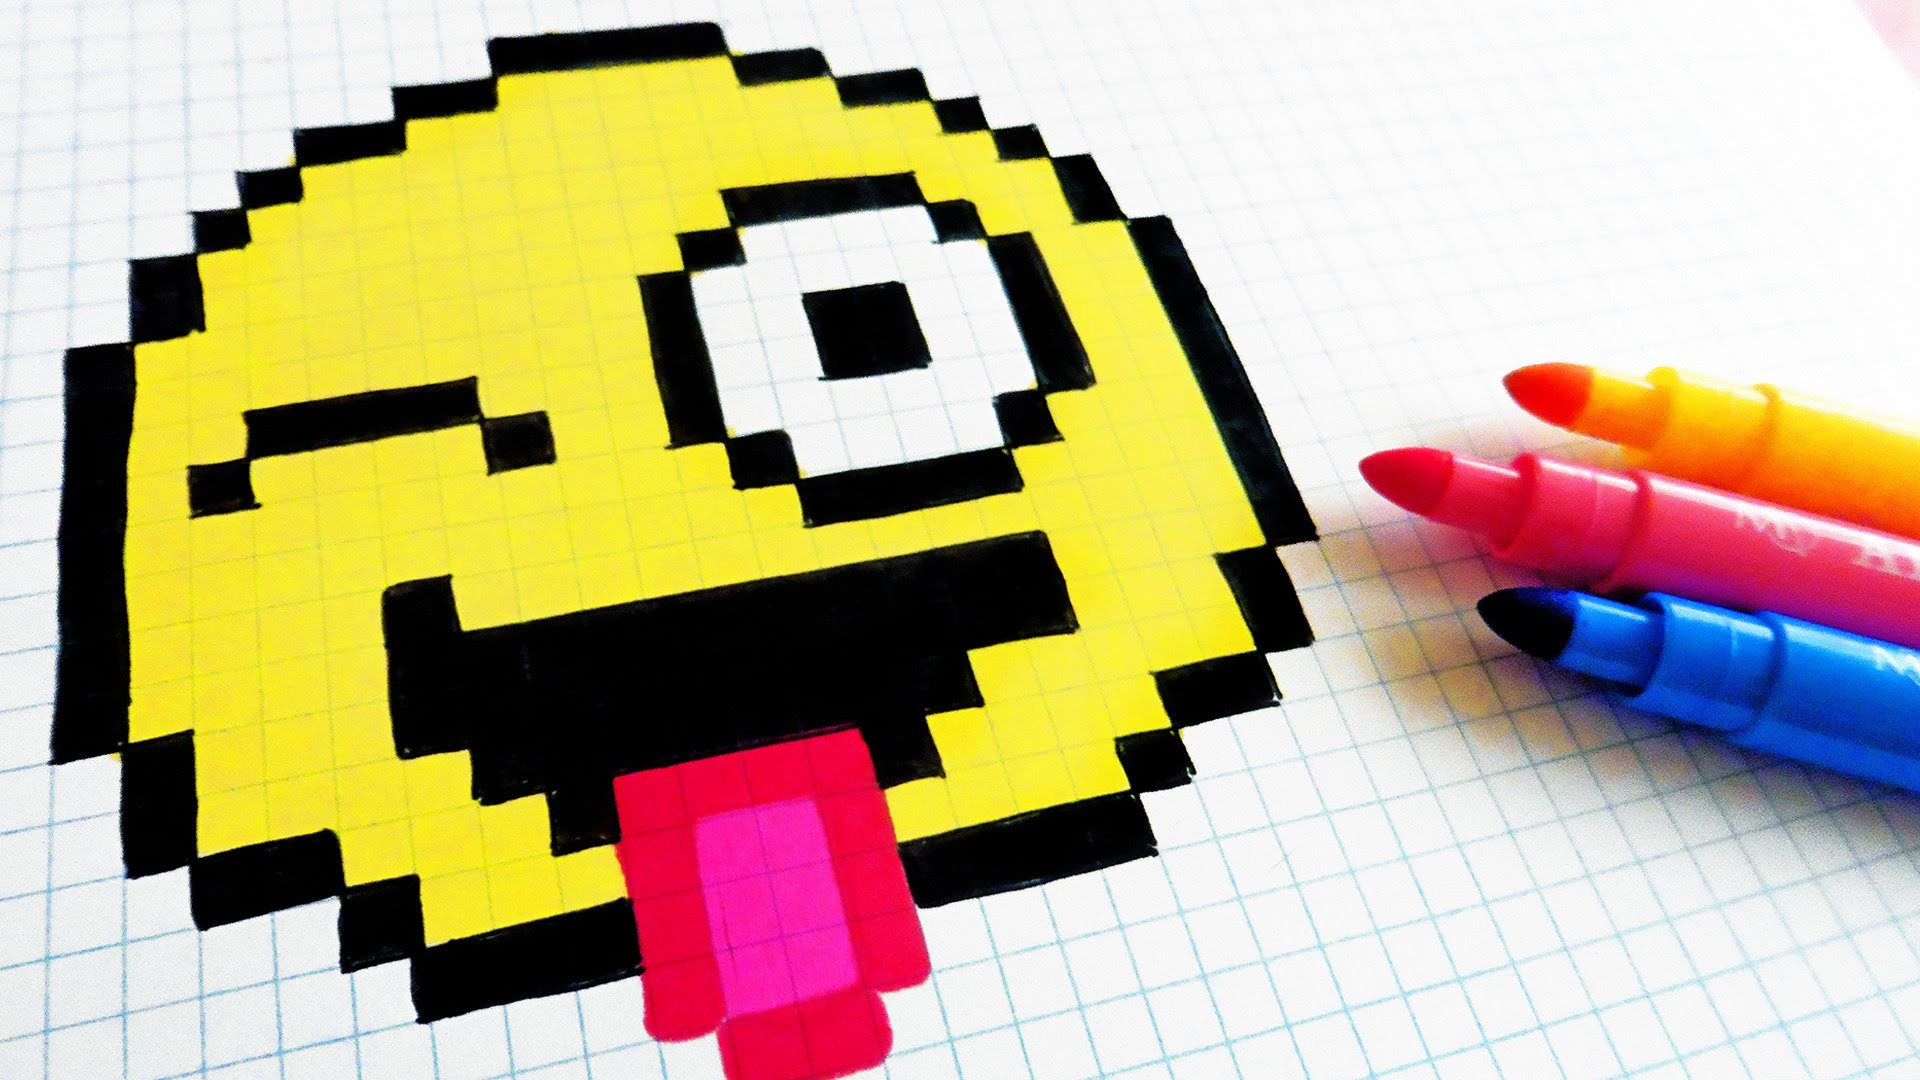 Drawn pixel art poxel Draw Emoji Emoji Handmade How